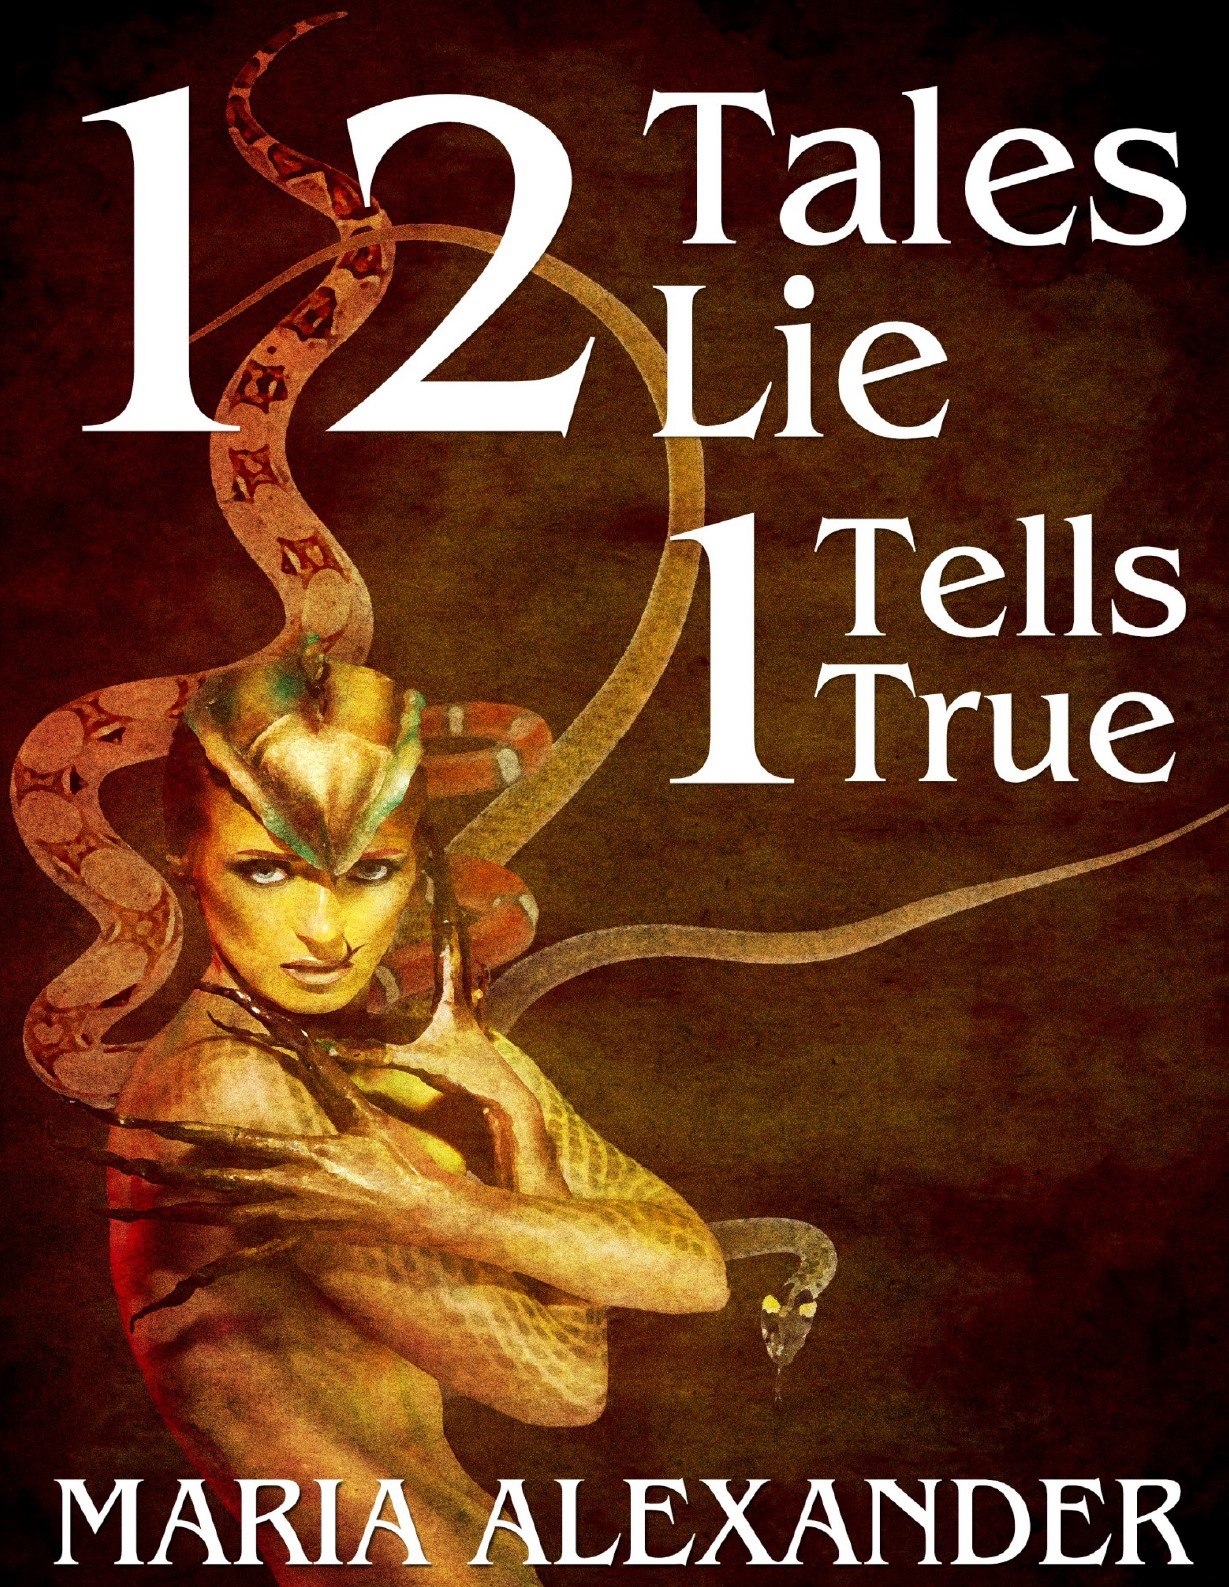 Maria Alexander's 12 Tales Lie 1 Tells True